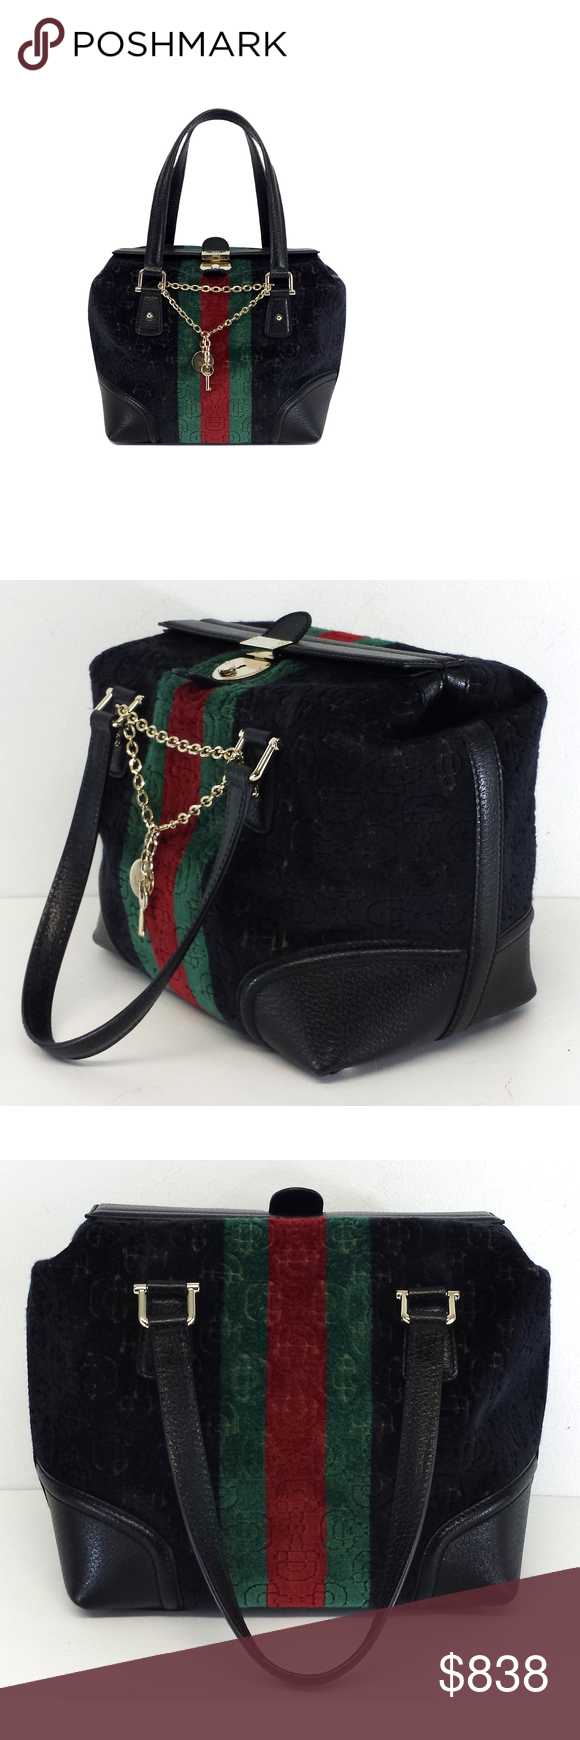 de109891 Gucci- Treasure Small Boston Handbag Treasure Small Boston Handbag ...